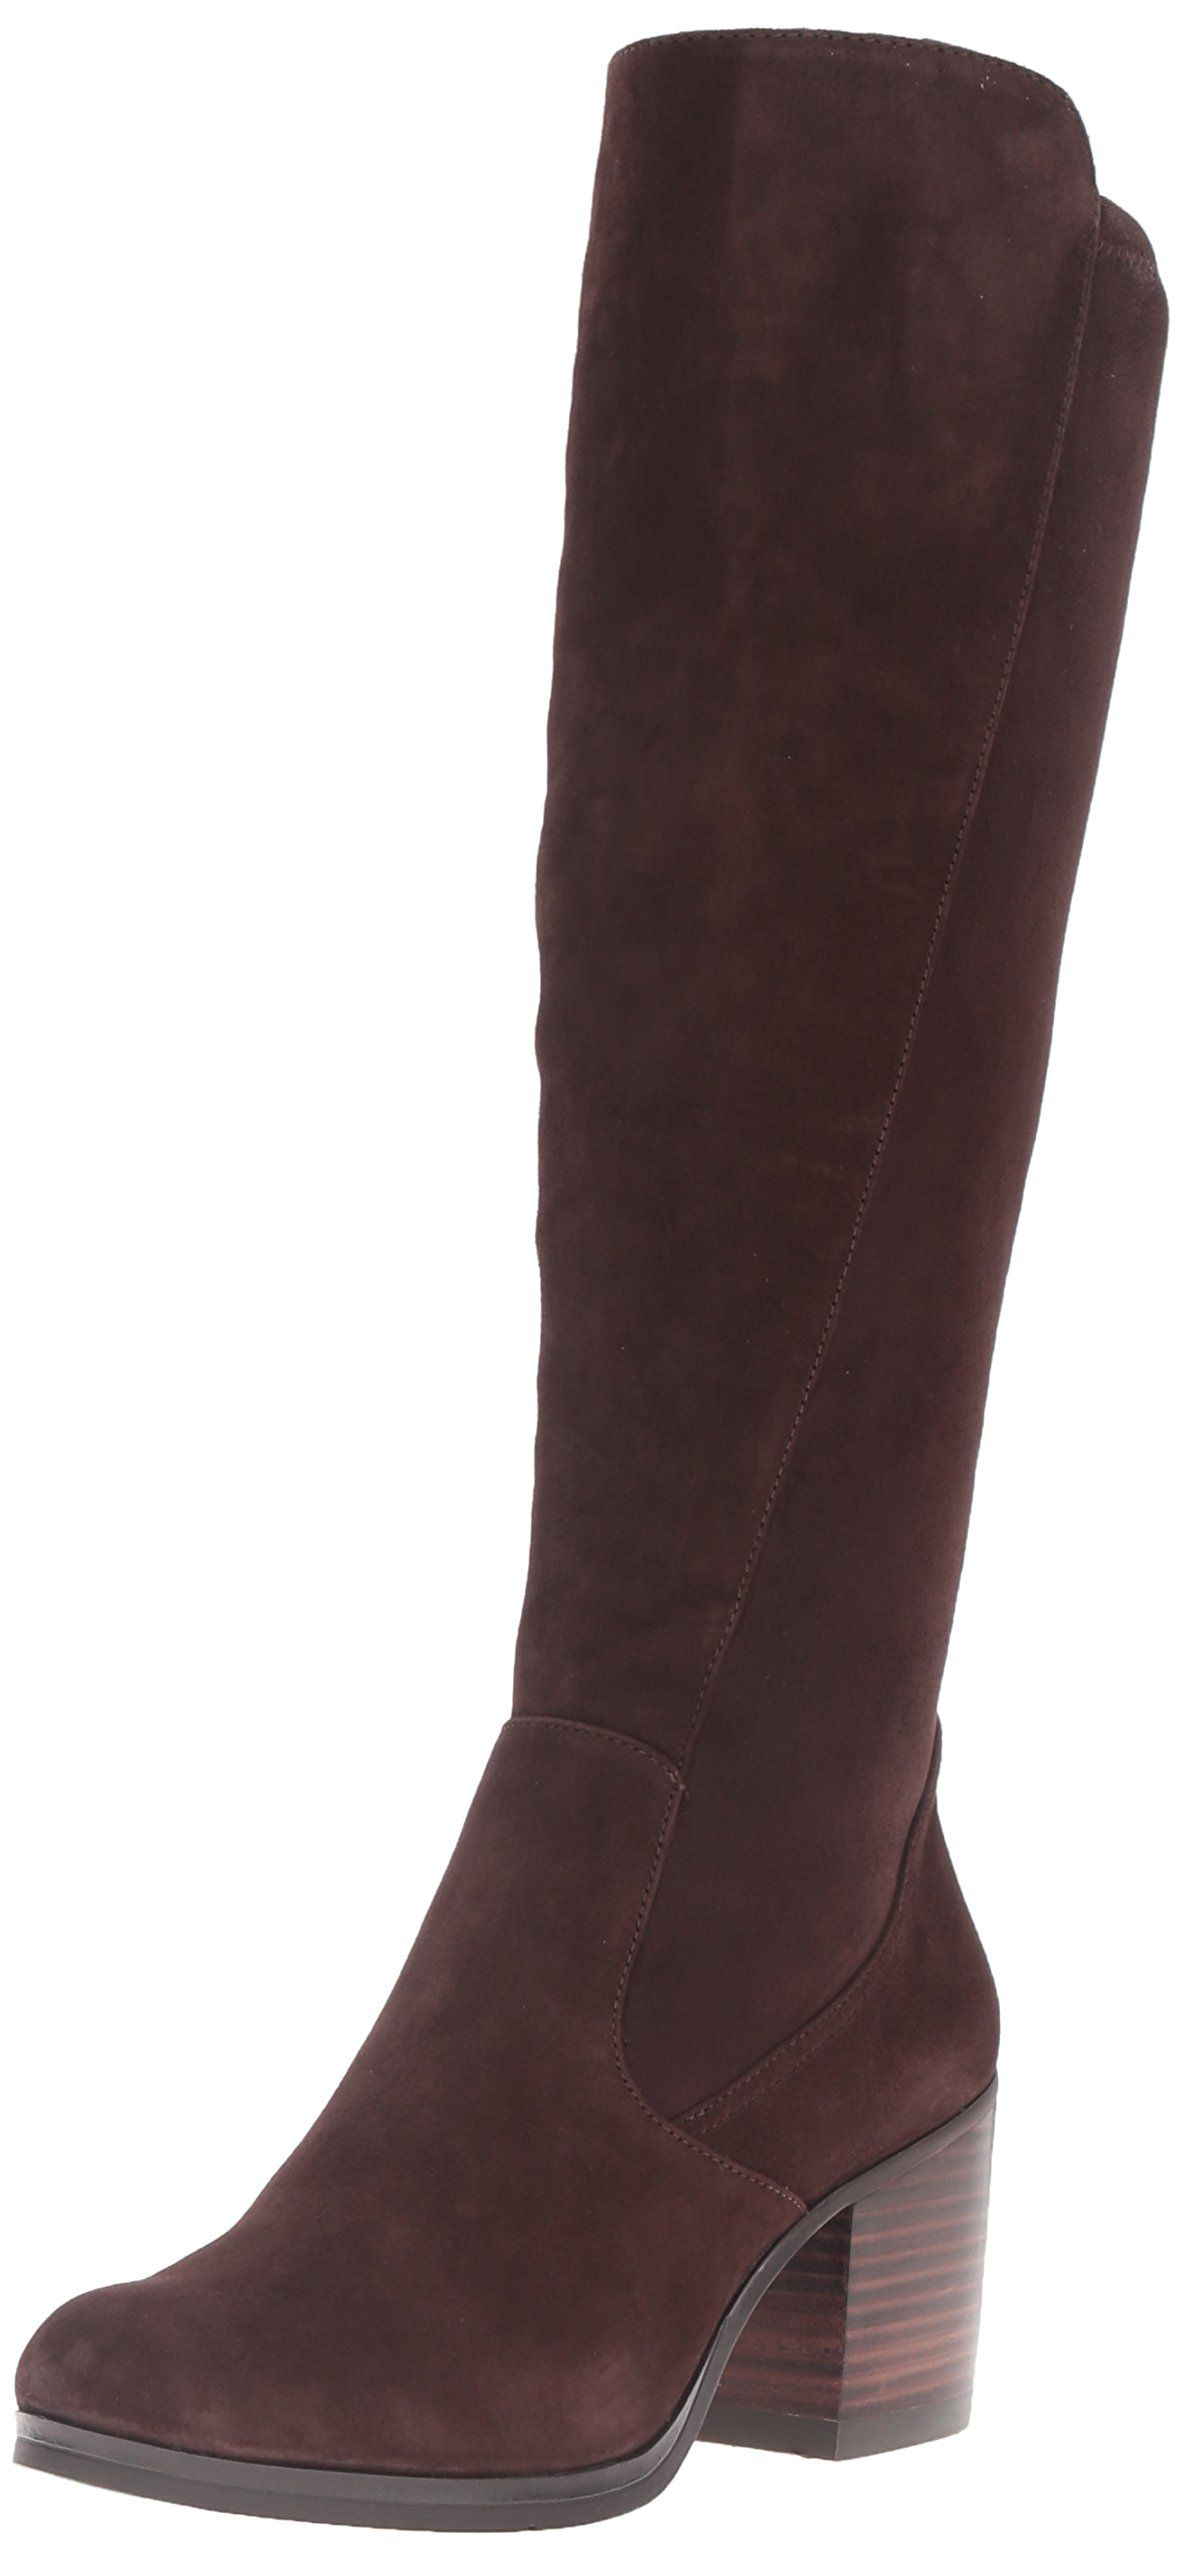 3c5d0a4286d Nine West Women's Jango Suede Over-The-Knee Boot | Fashion Ideas ...